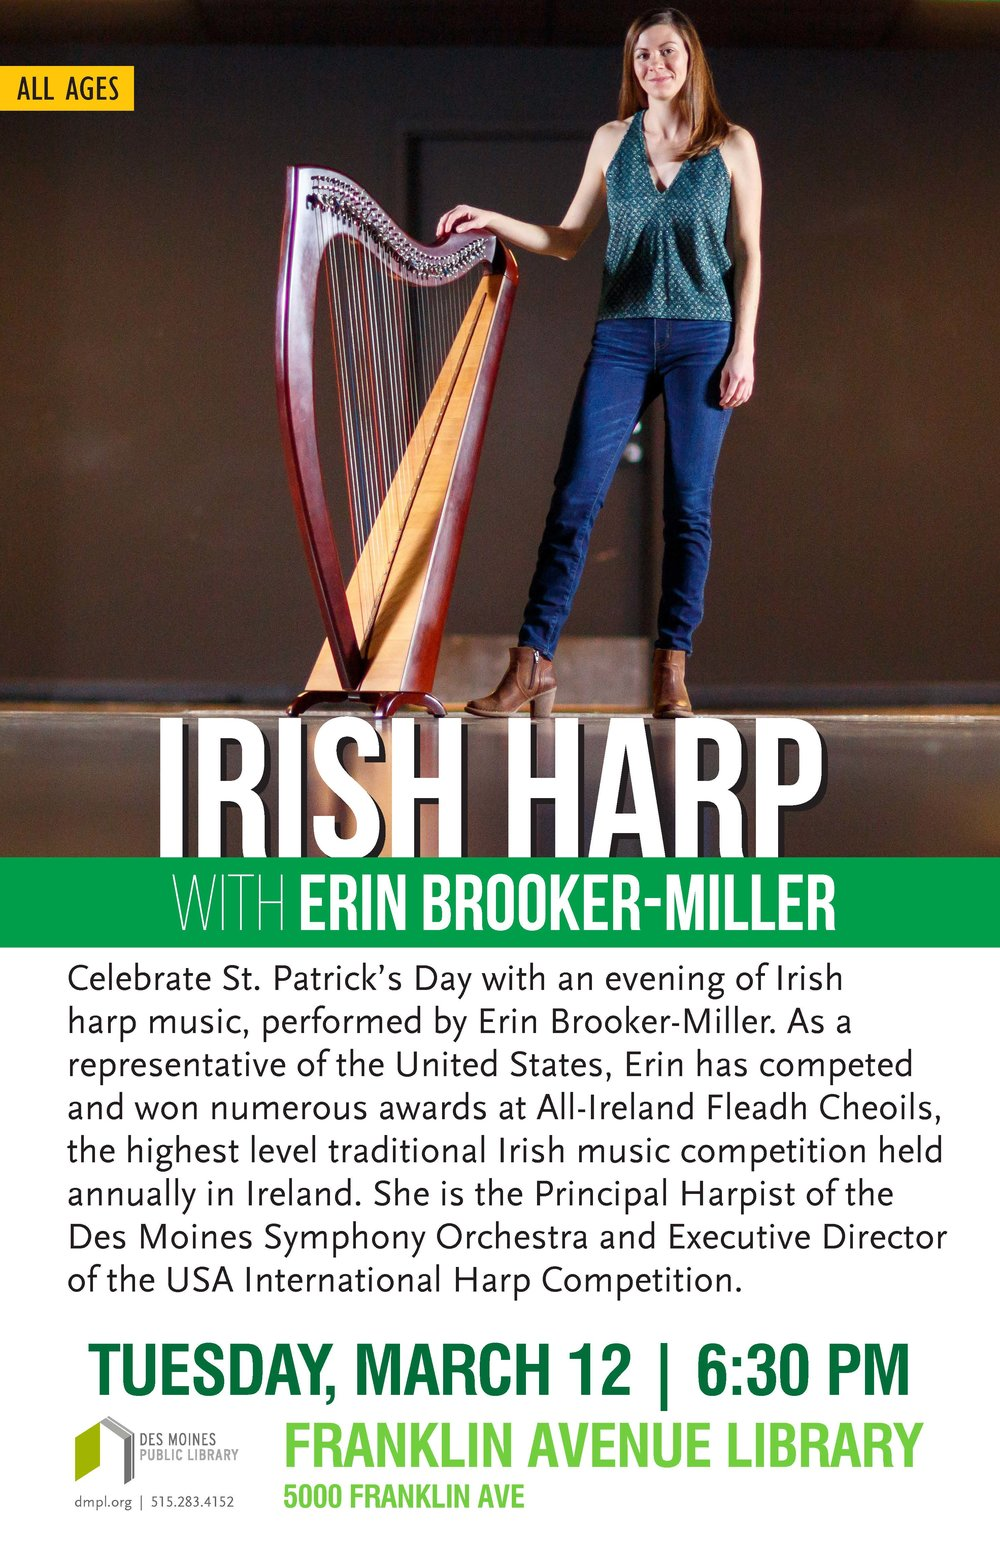 FR IRISH HARP WITH ERIN BOOKER-MILLER (004).jpg